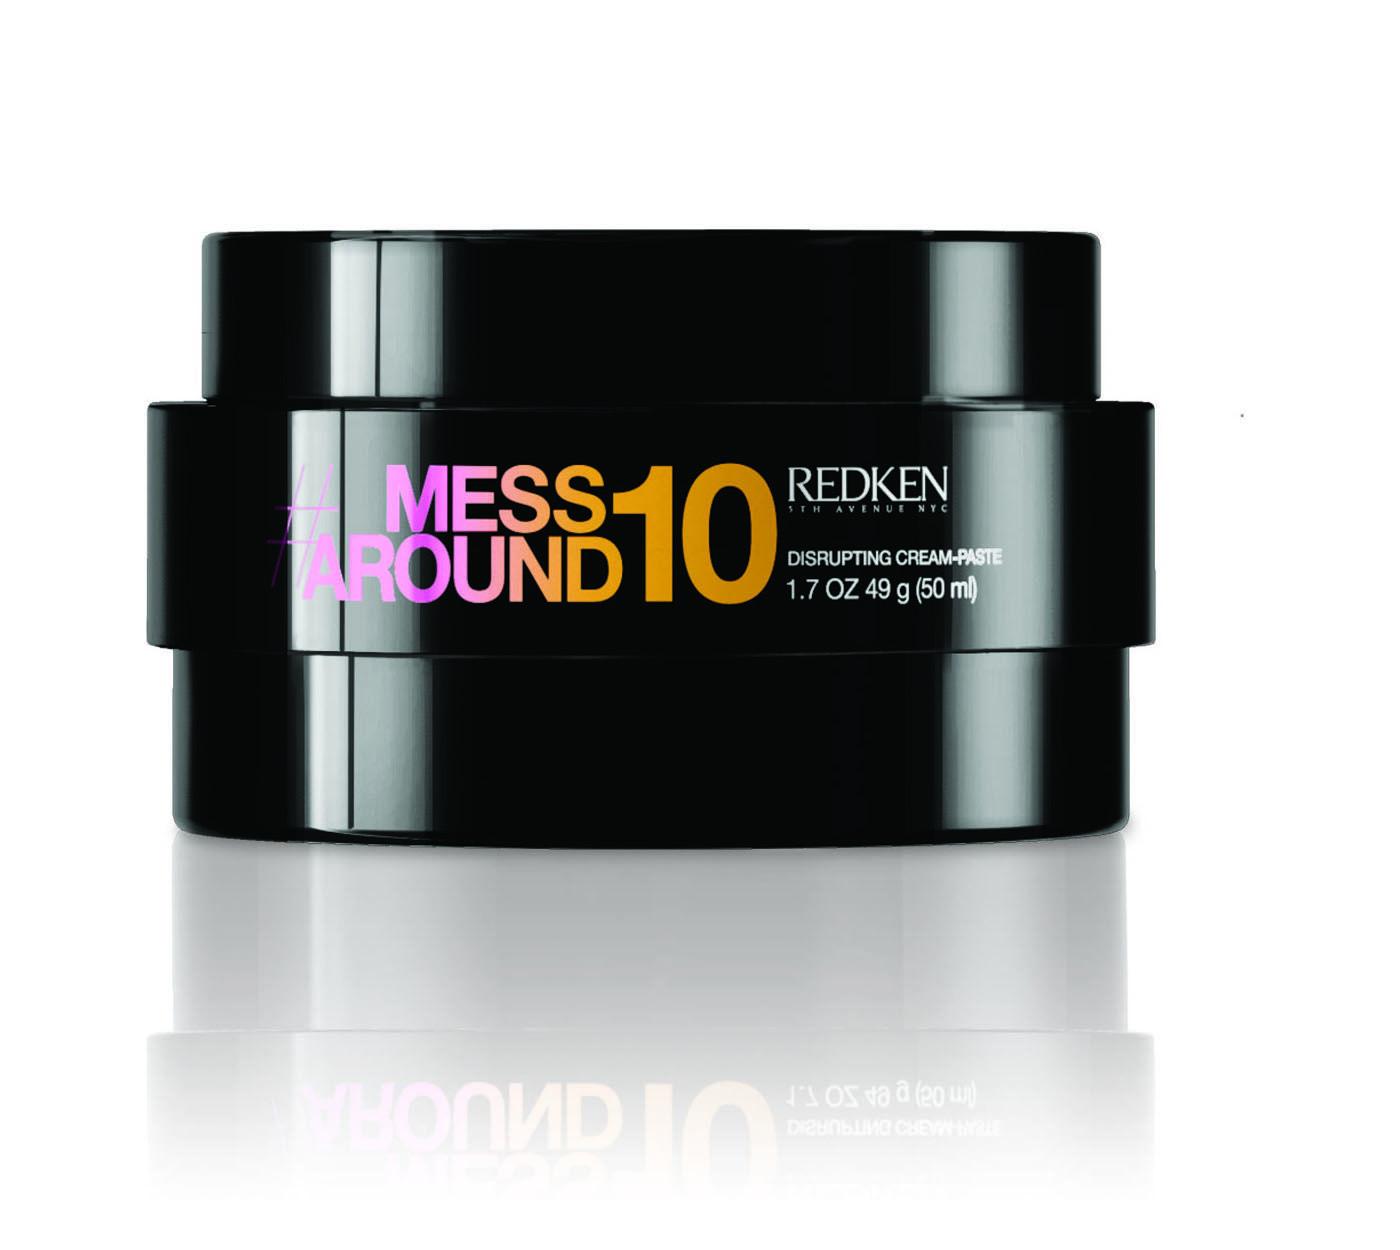 Redken Flex Mess Around 10 Disrupting Cream Paste 50ml